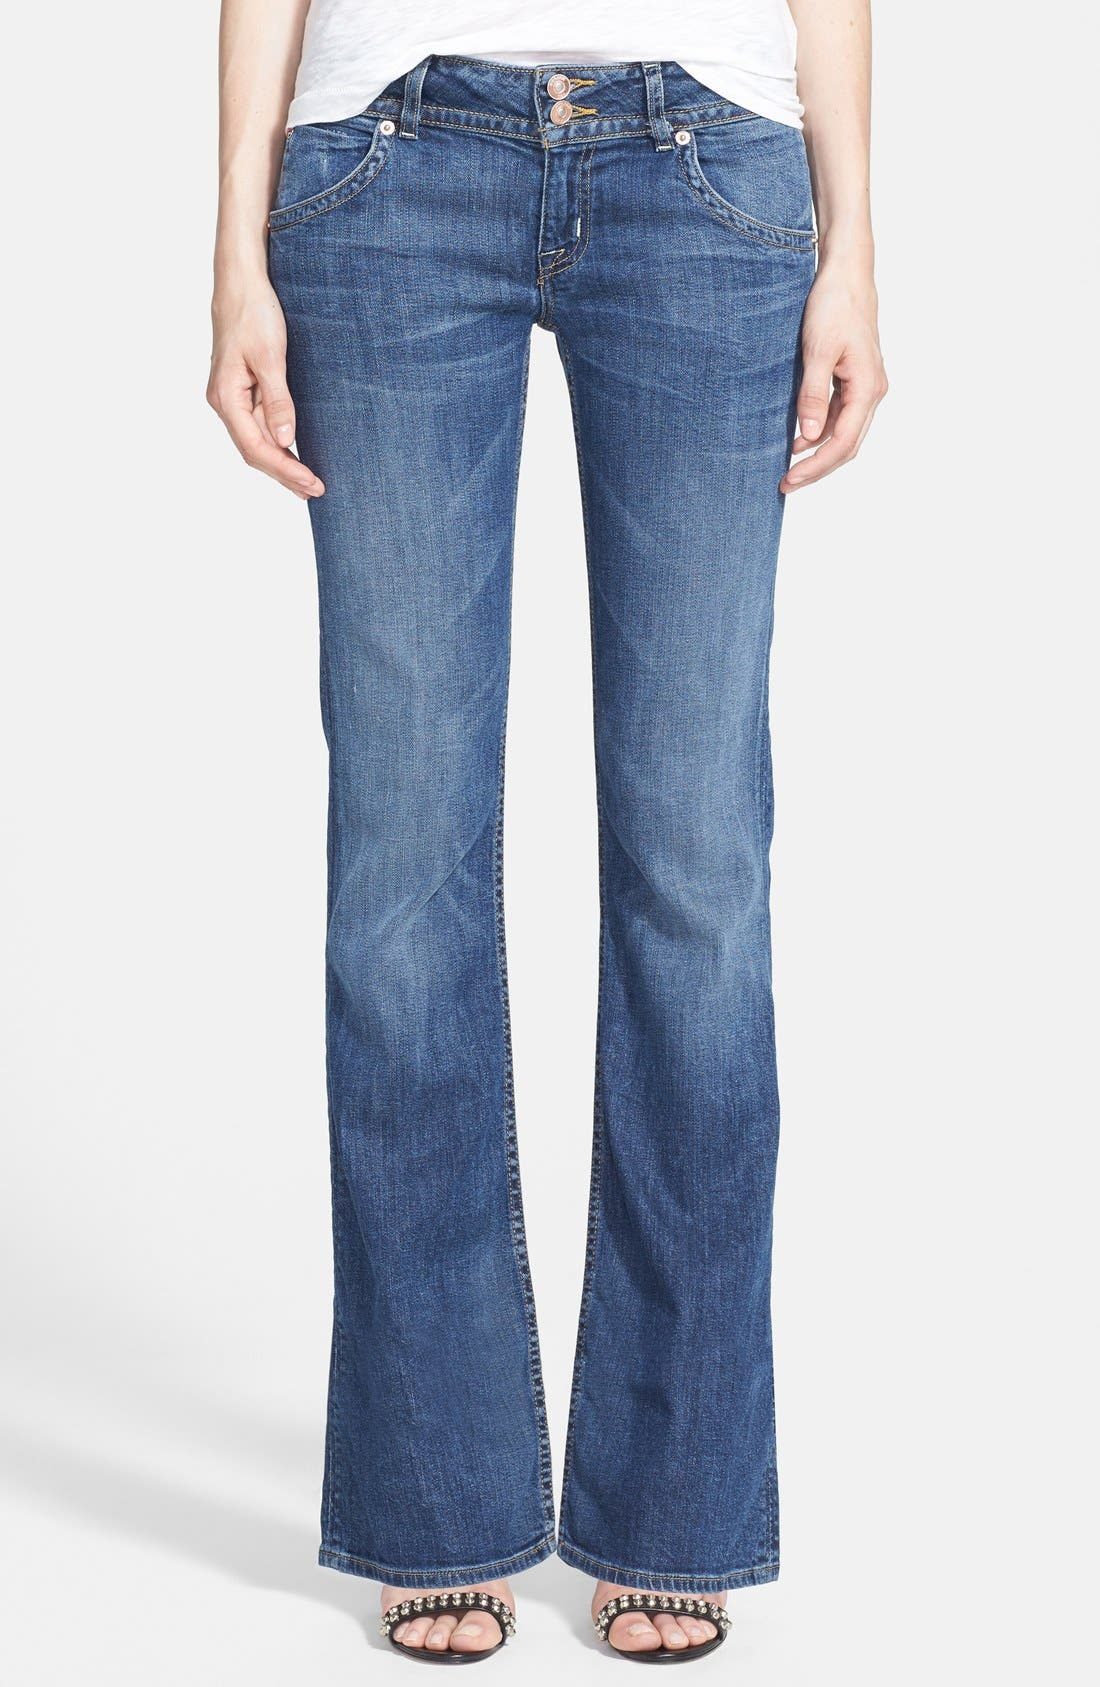 Main Image - Hudson Jeans 'Signature' Bootcut Jeans (Hackney) (Petite)